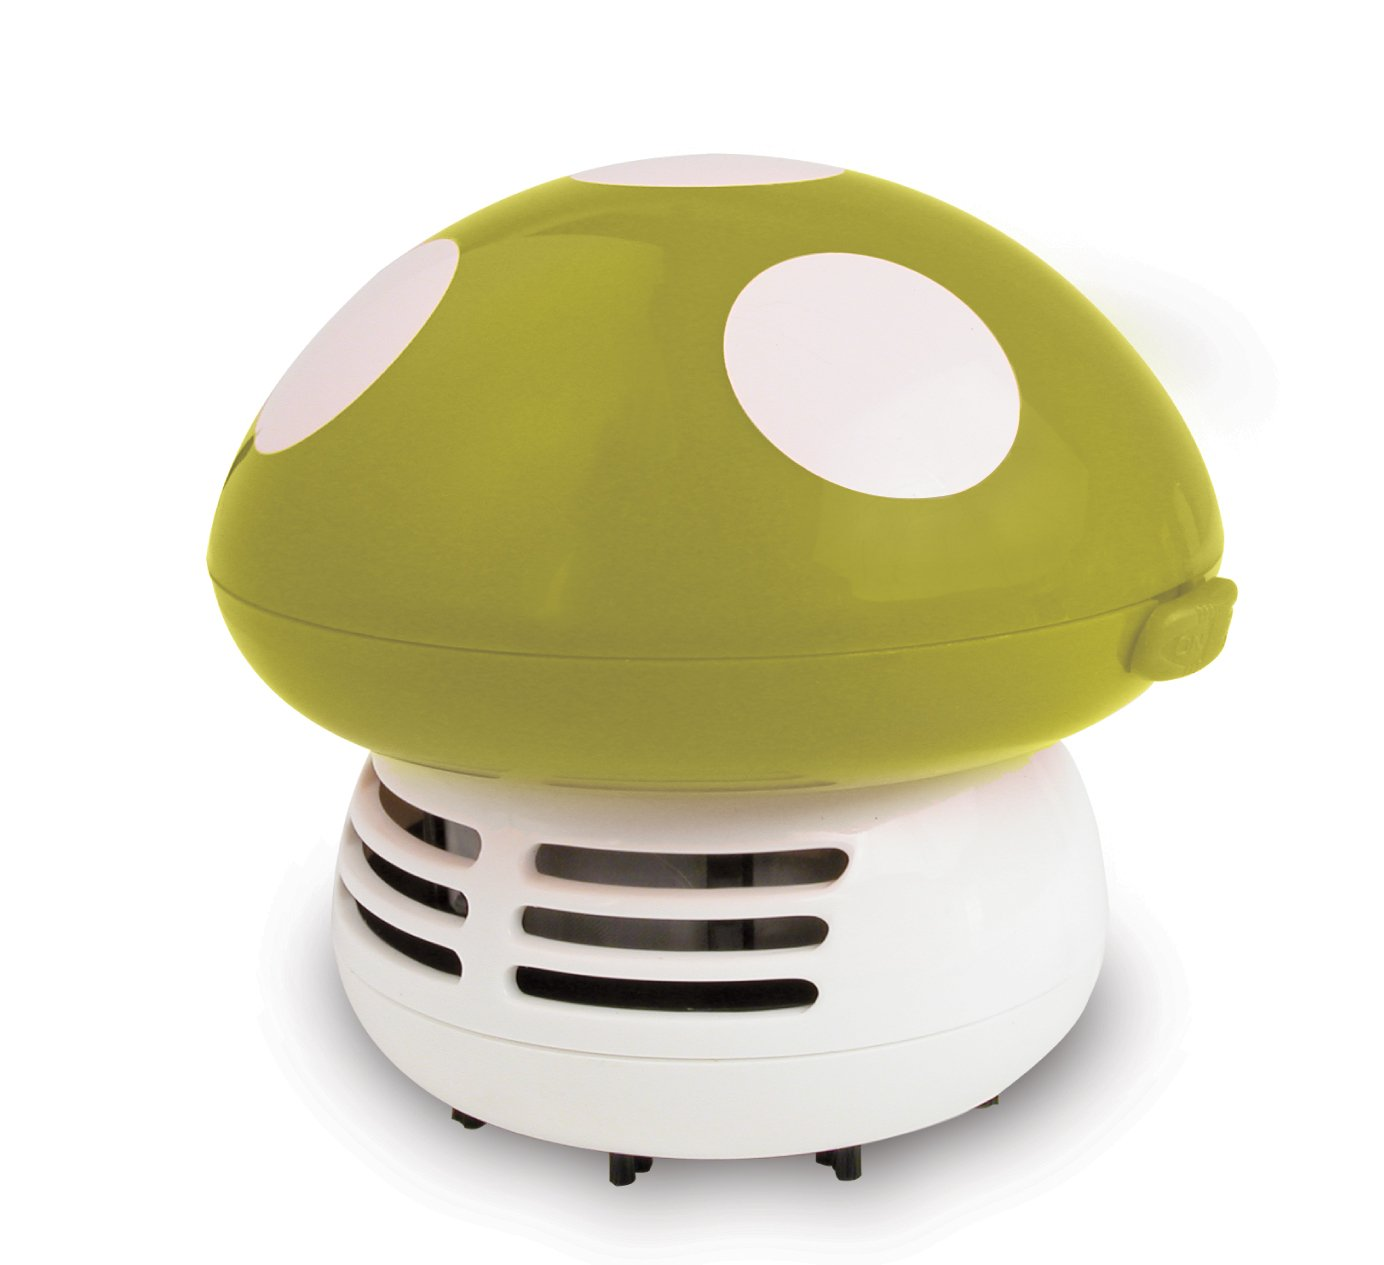 Great Amazon.com   Starfrit 060777 006 GREE Mushroom Shaped Mini Table Vacuum  Cleaner, Green   Cordless   Household Upright Vacuums